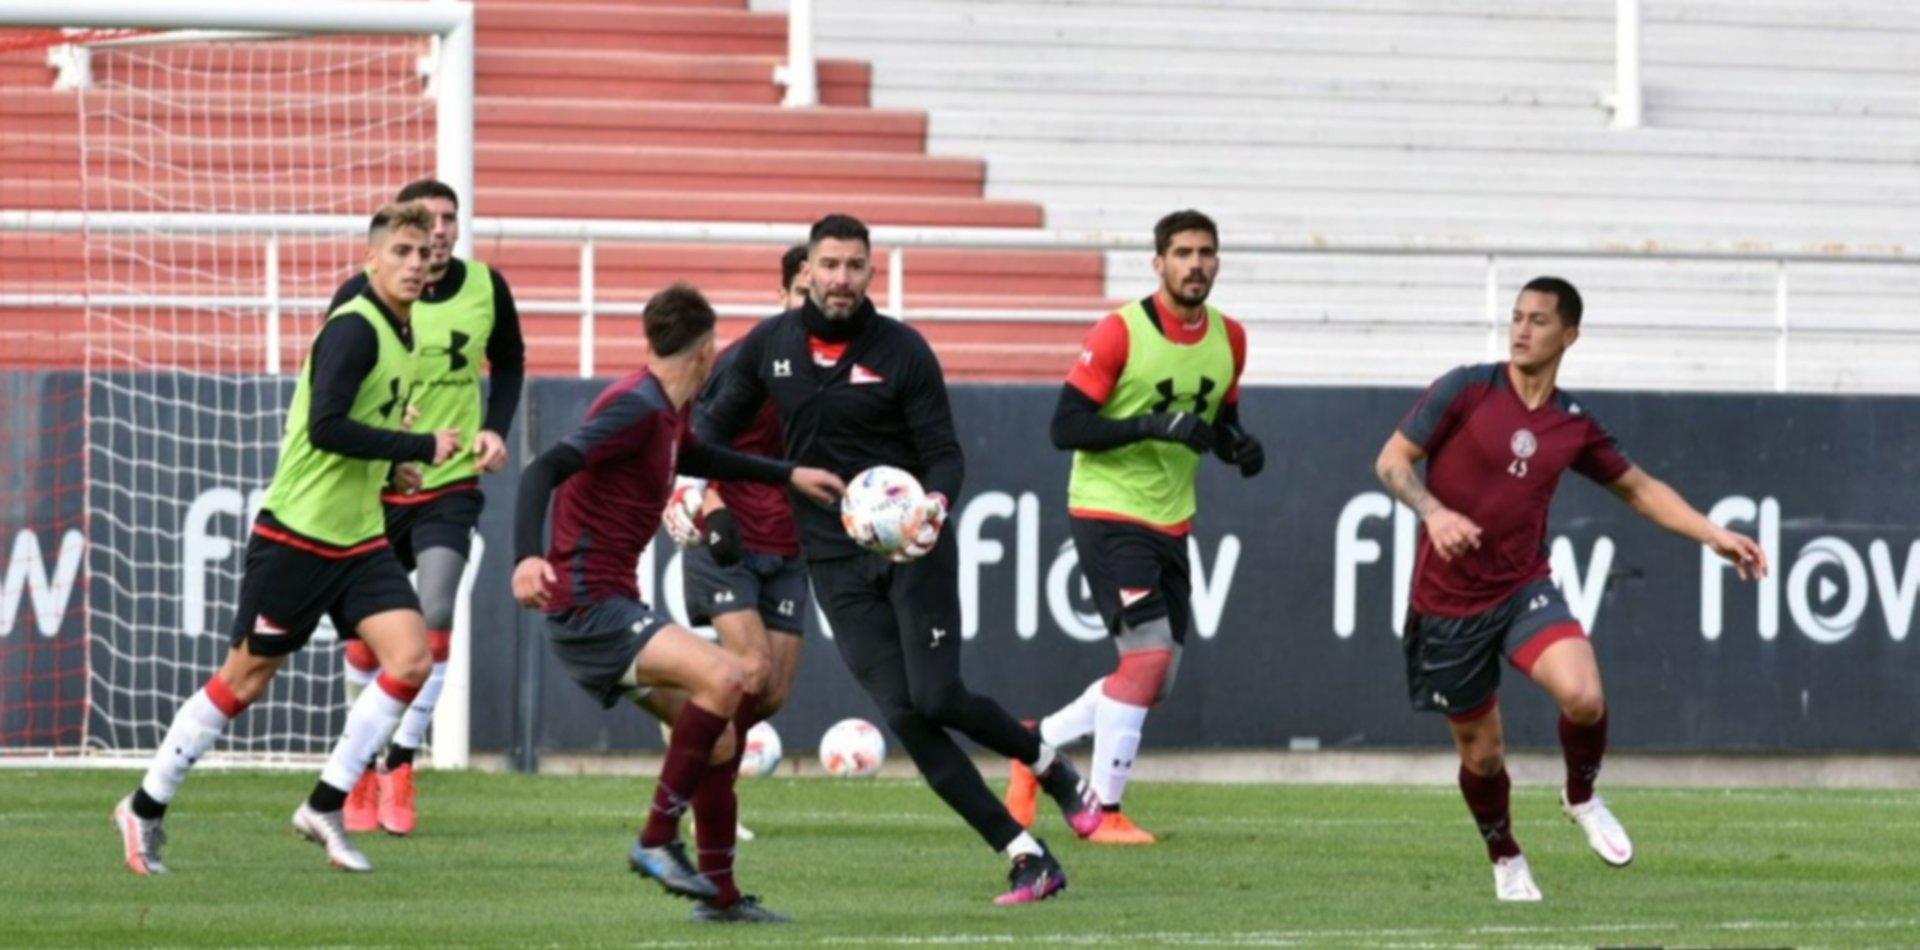 Estudiantes ganó su primer amistoso de pretemporada: derrotó a Lanús por 2 a 1